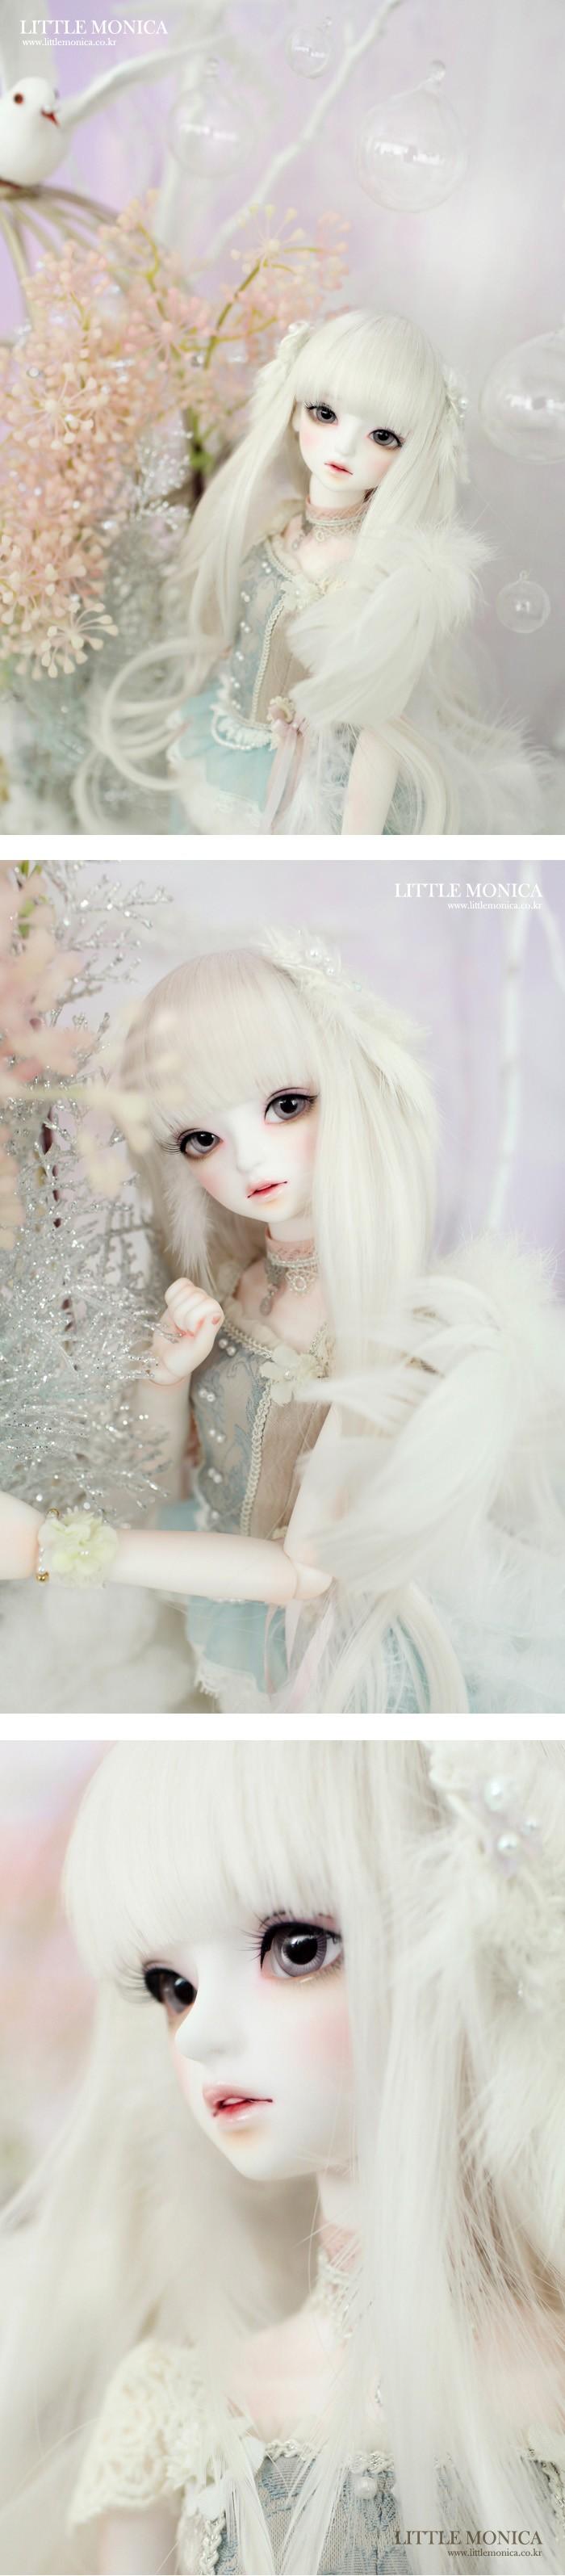 Little Sophia - Little Monica 41cm girl - BJD Dolls, Accessories - Alice's Collections